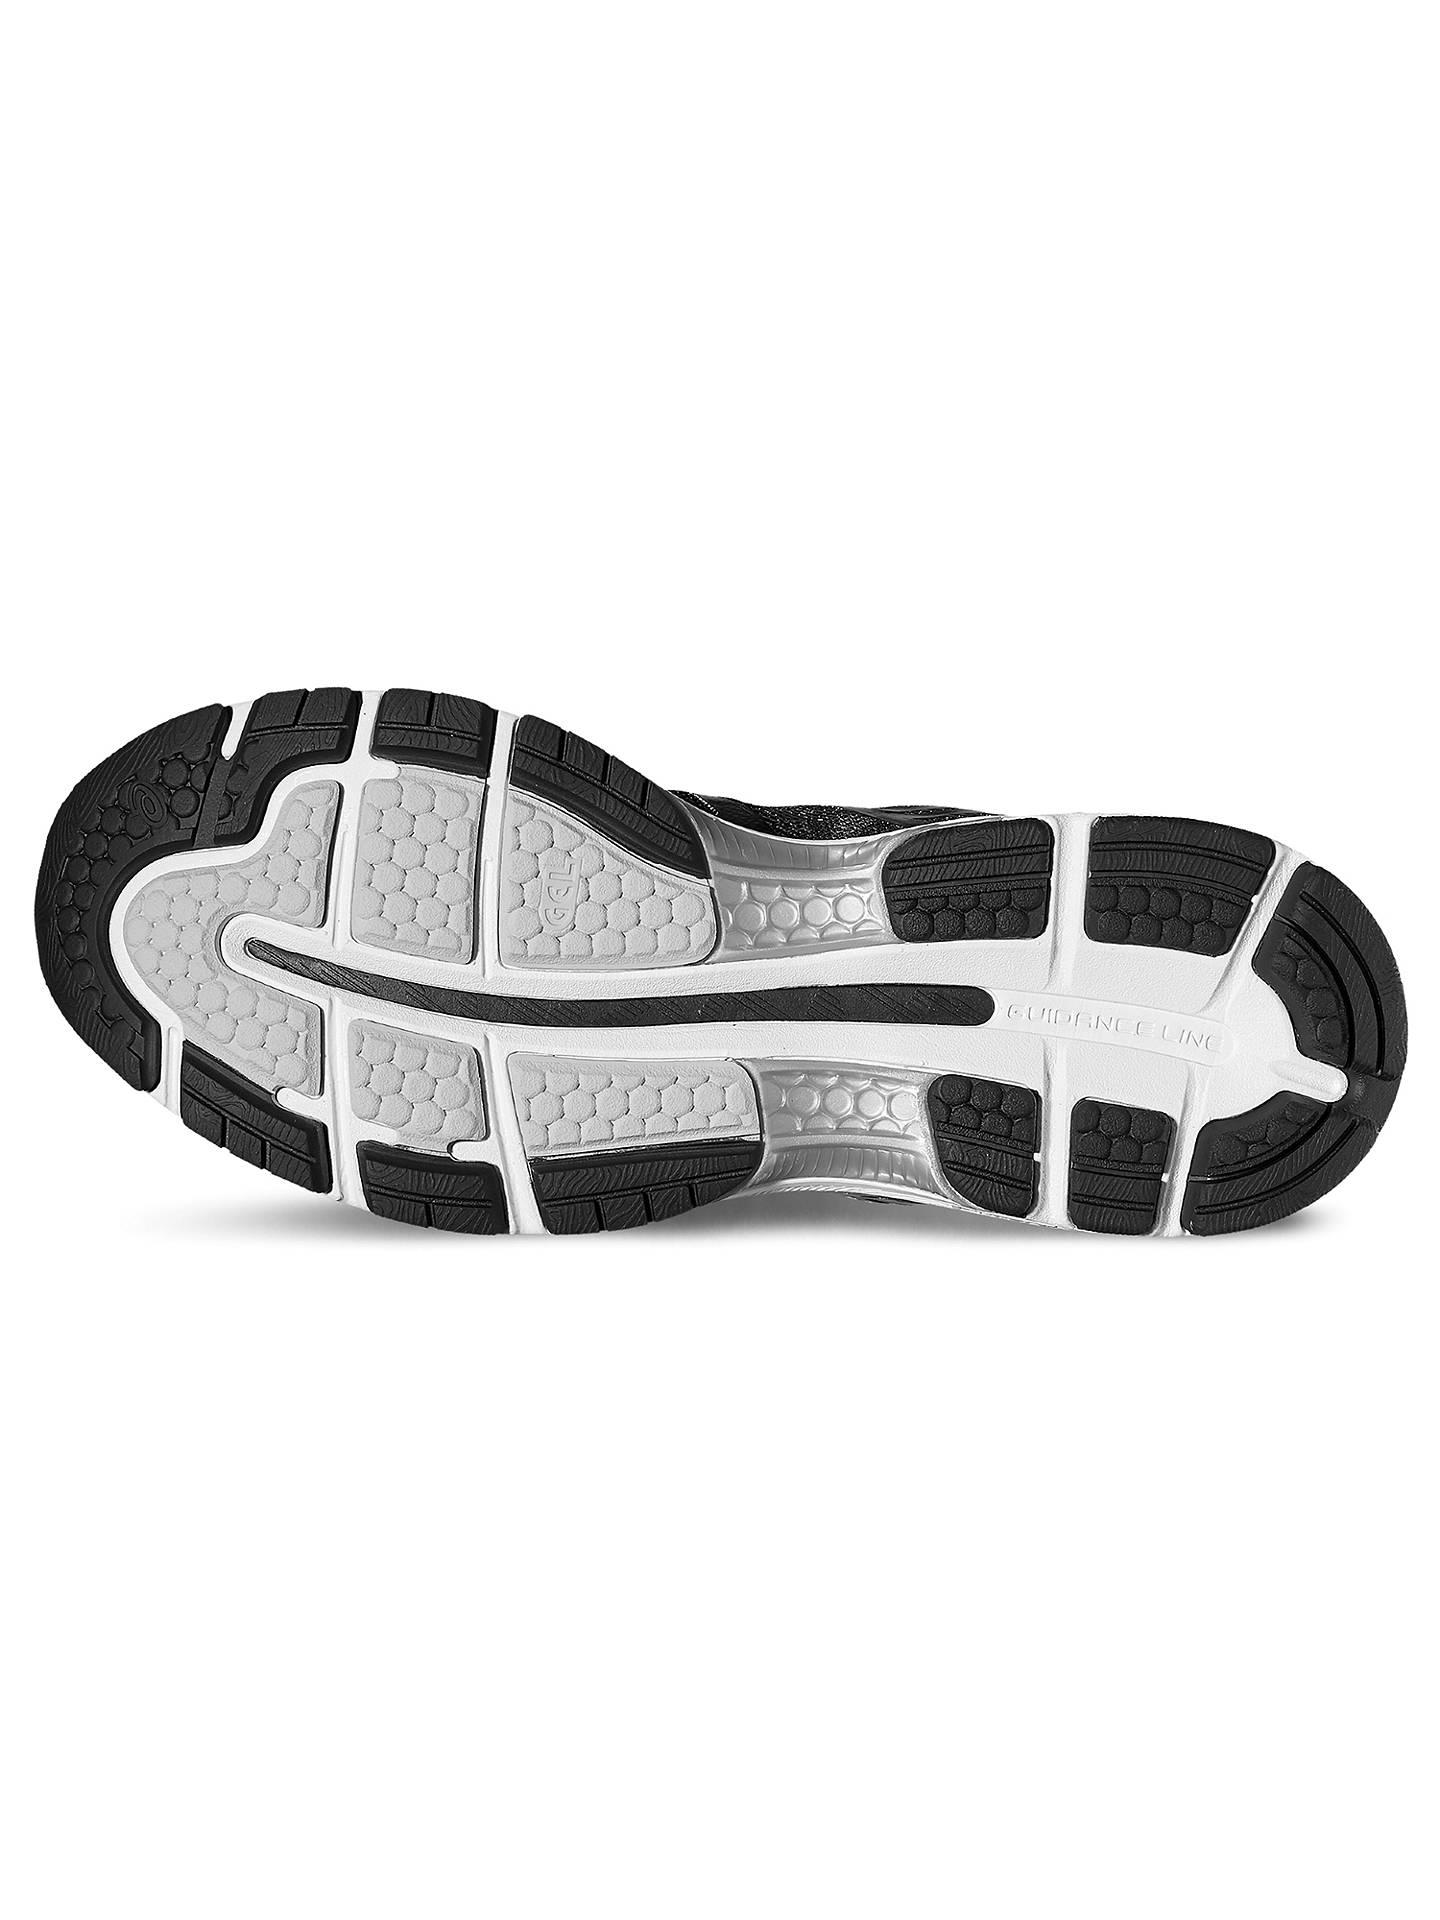 uk availability 25bf5 61365 Asics Gel Nimbus 19 Men's Running Shoes, Black at John Lewis ...